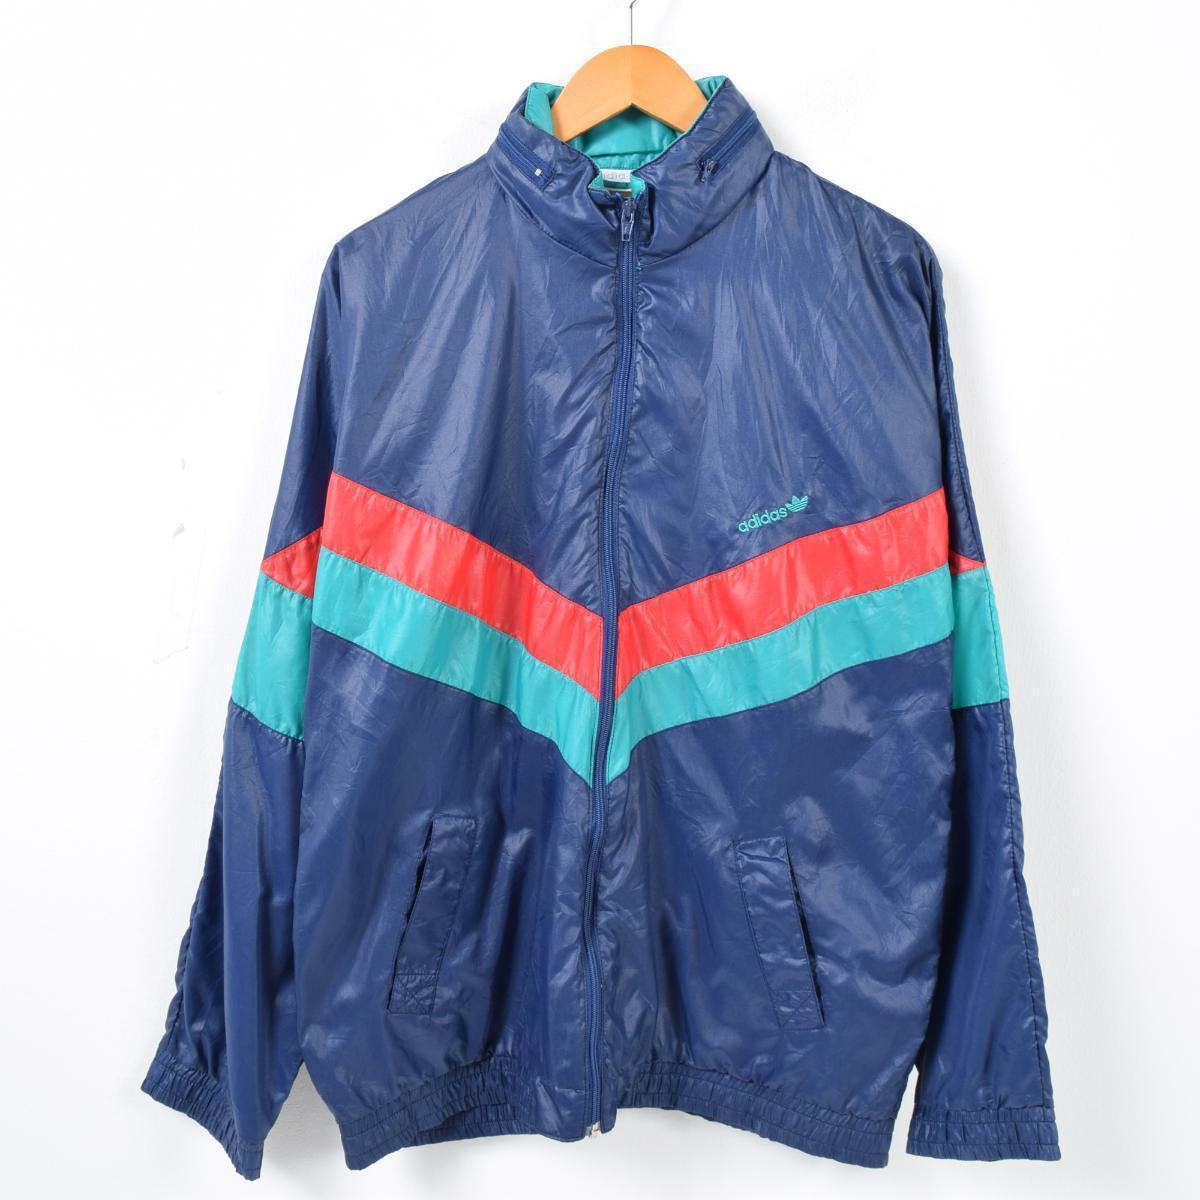 41810e92dffa 80s Adidas adidas food storing type nylon jacket men L vintage  waj6520